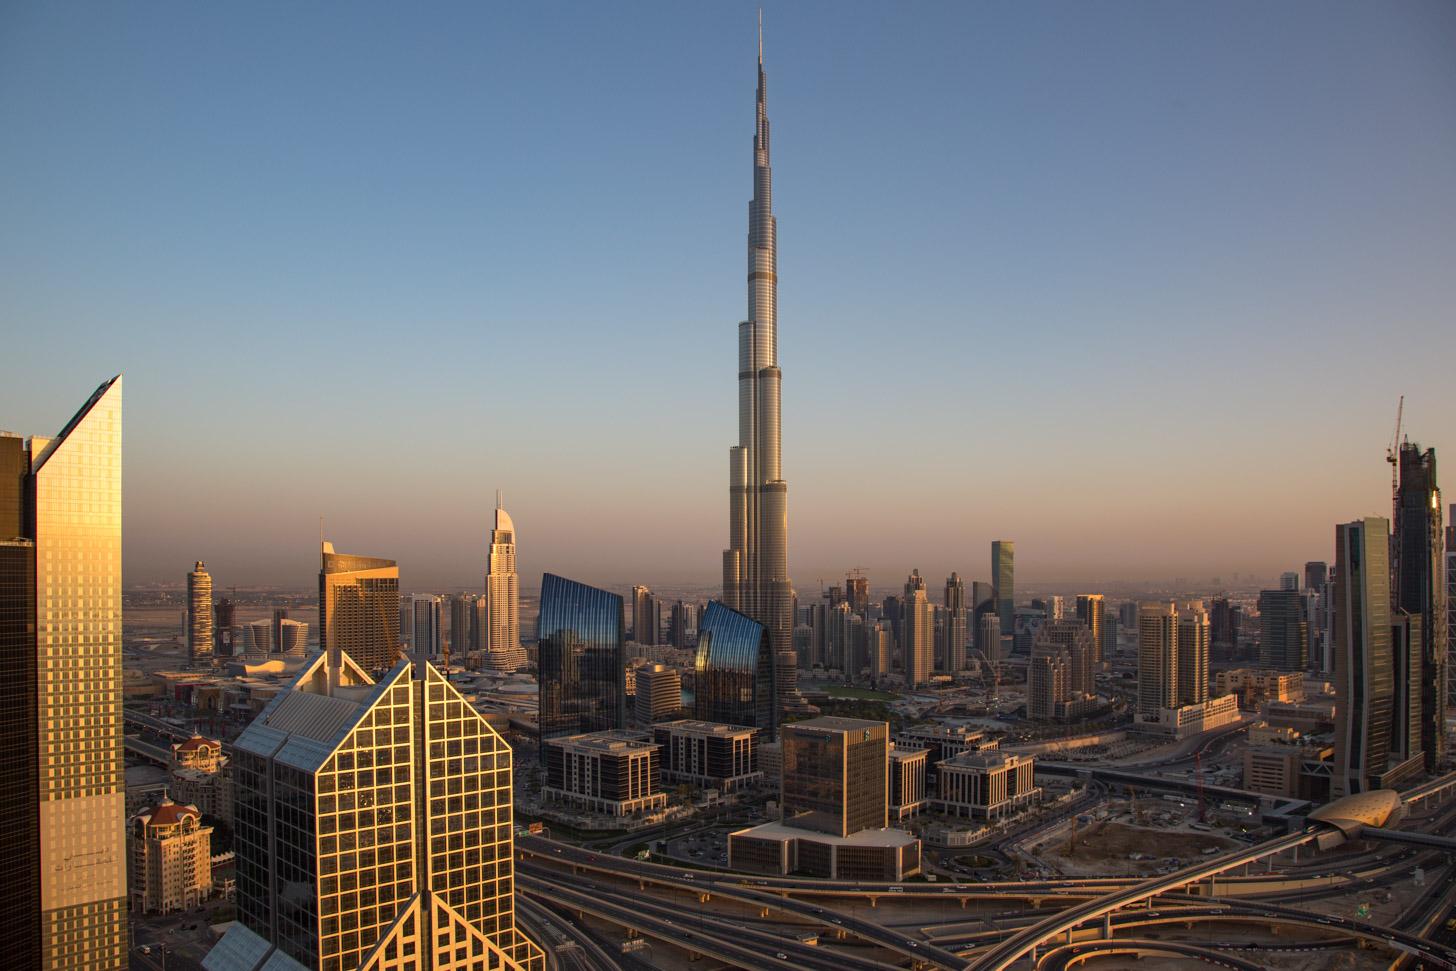 Uitzicht op Burj Khalifa en Downtown Dubai tegen zonsondergang.